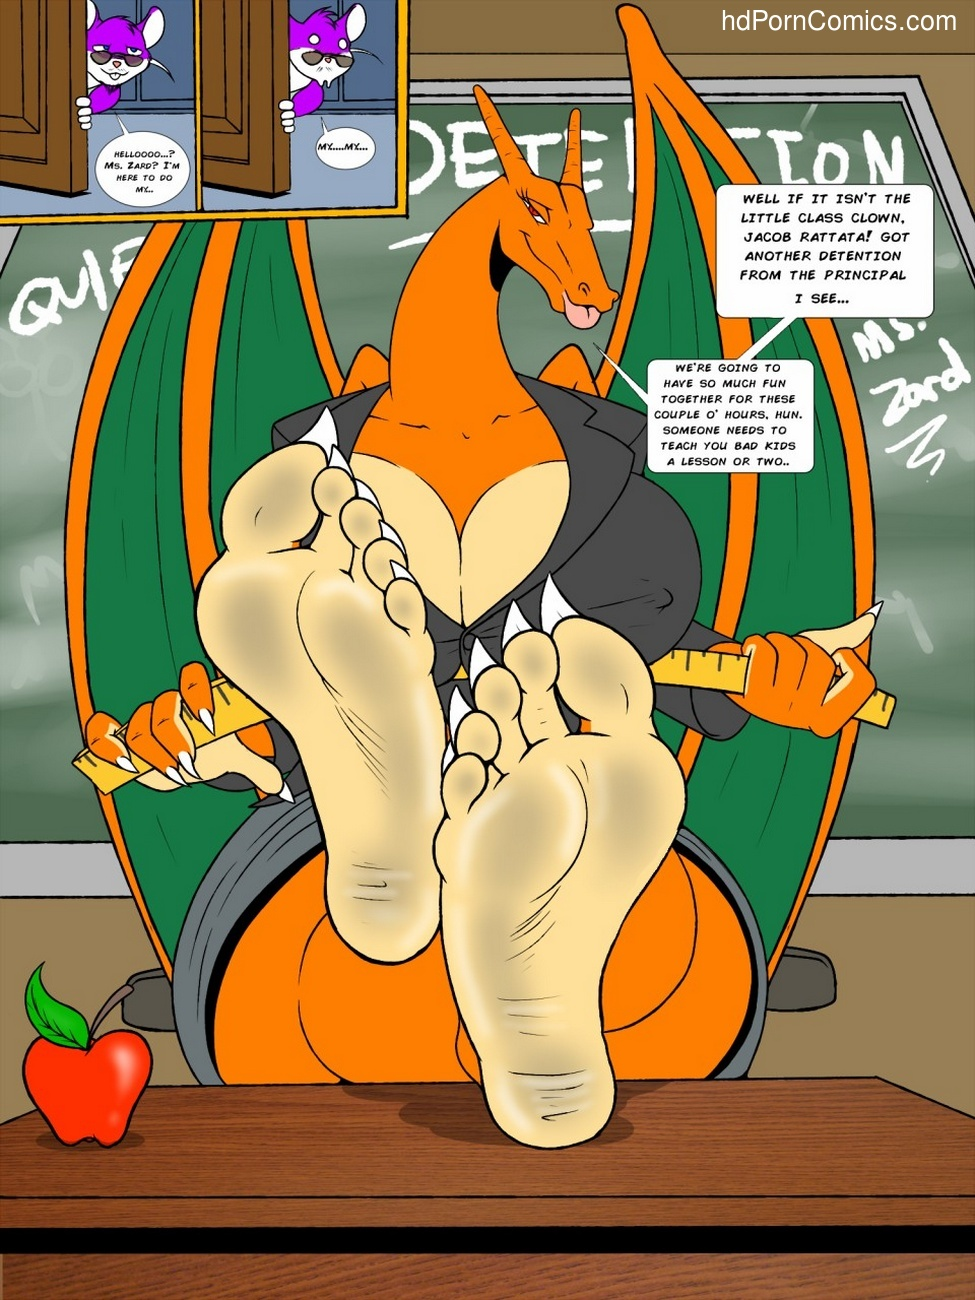 Teaching A Lesson 2 free sex comic